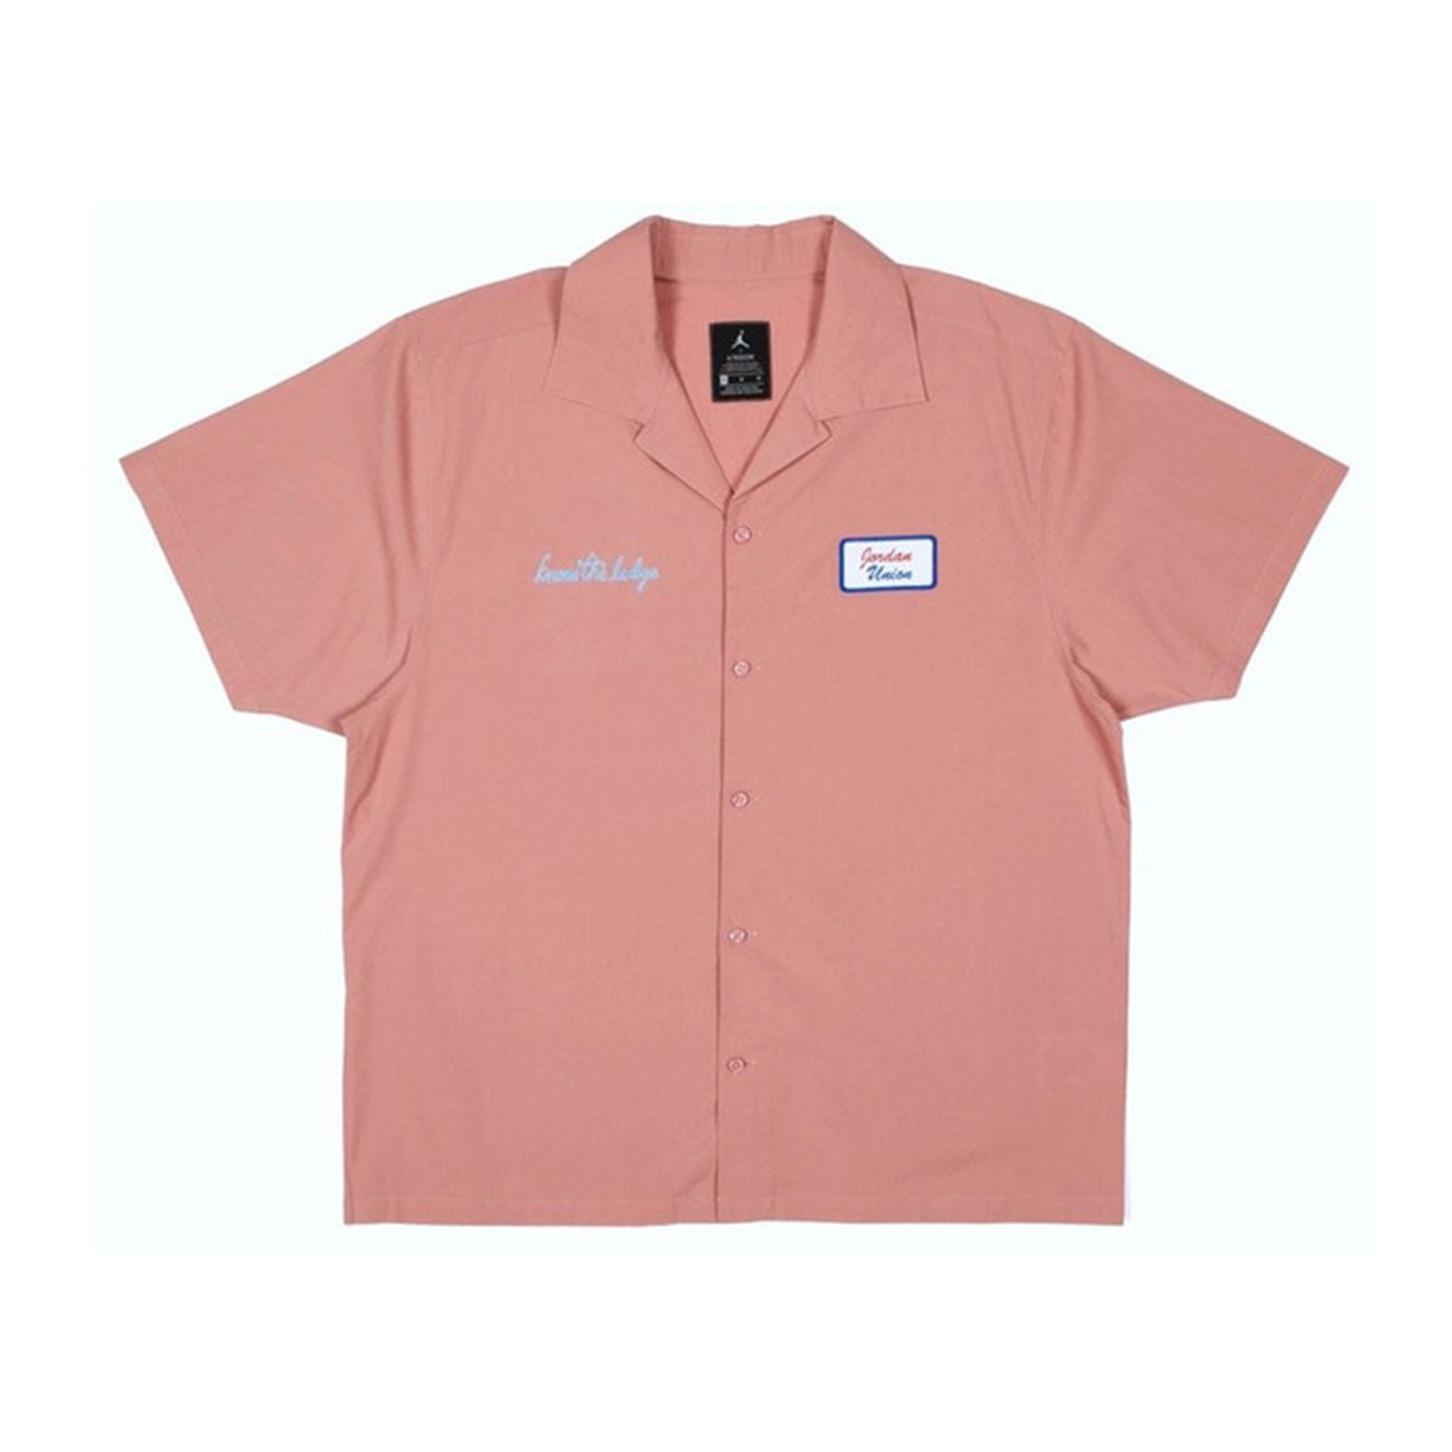 Jordan x Union Mechanic Shirt Rust Pink